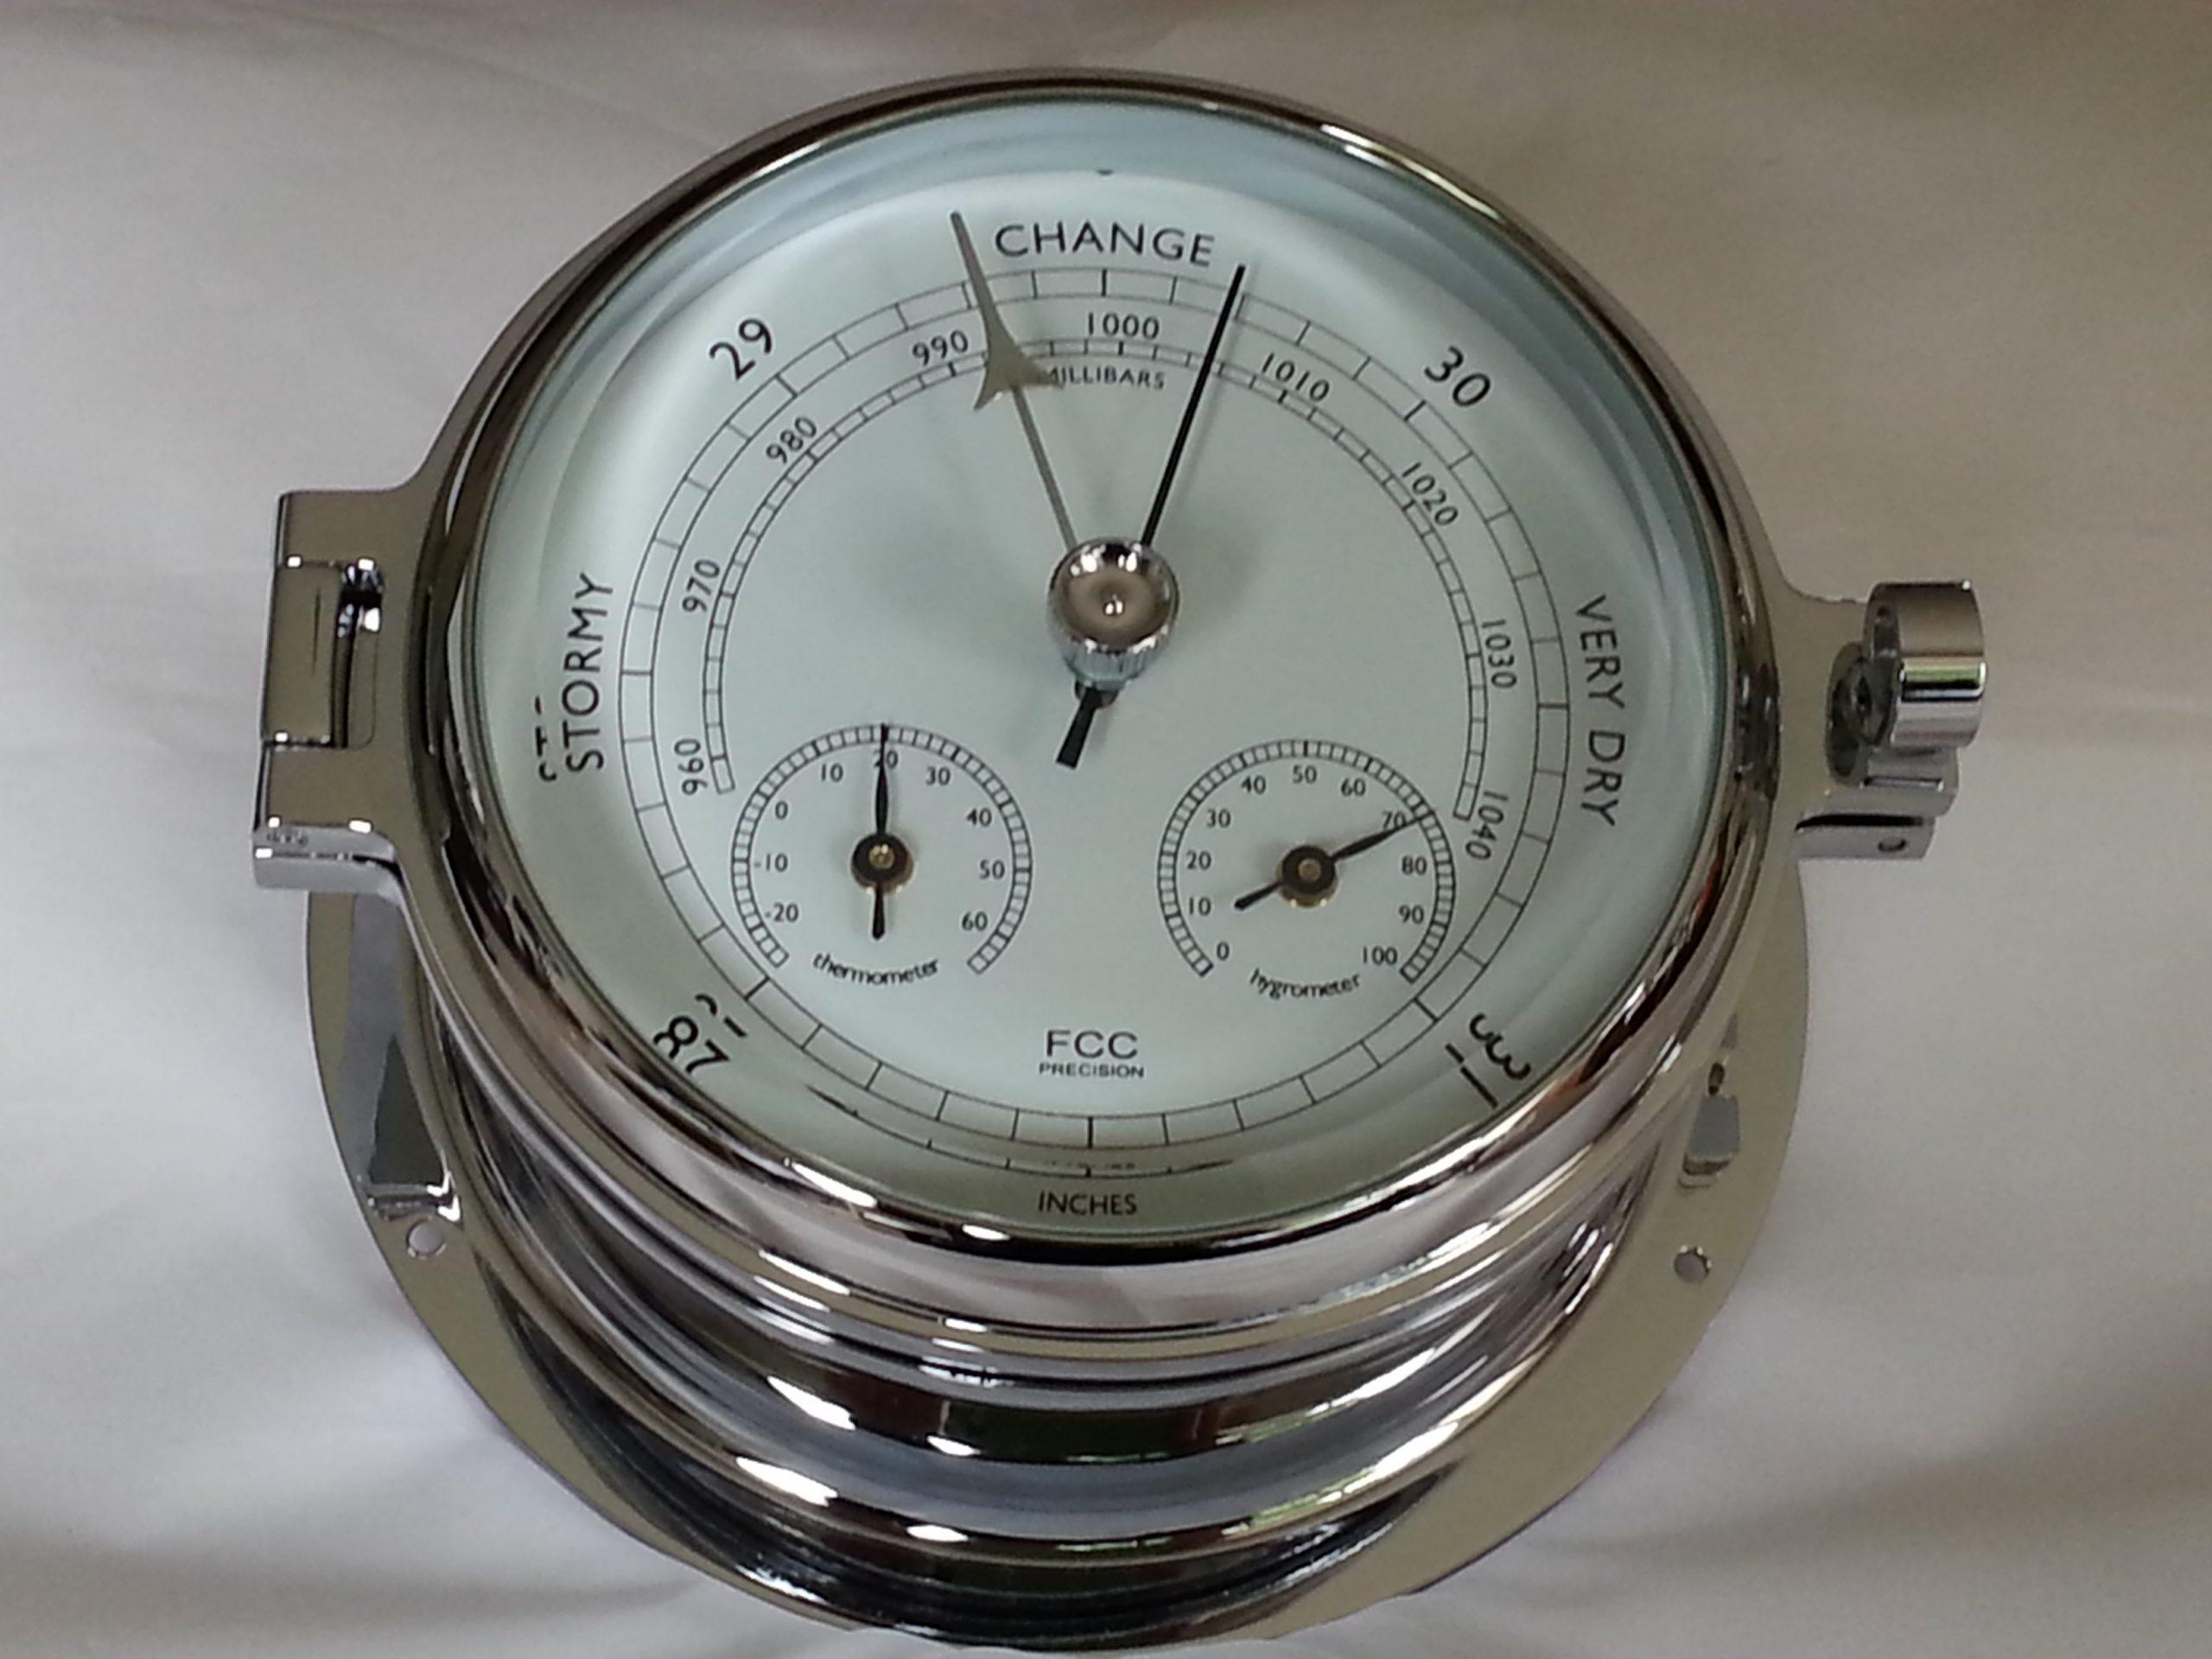 Chrome Barometer Thermometer Hygrometer